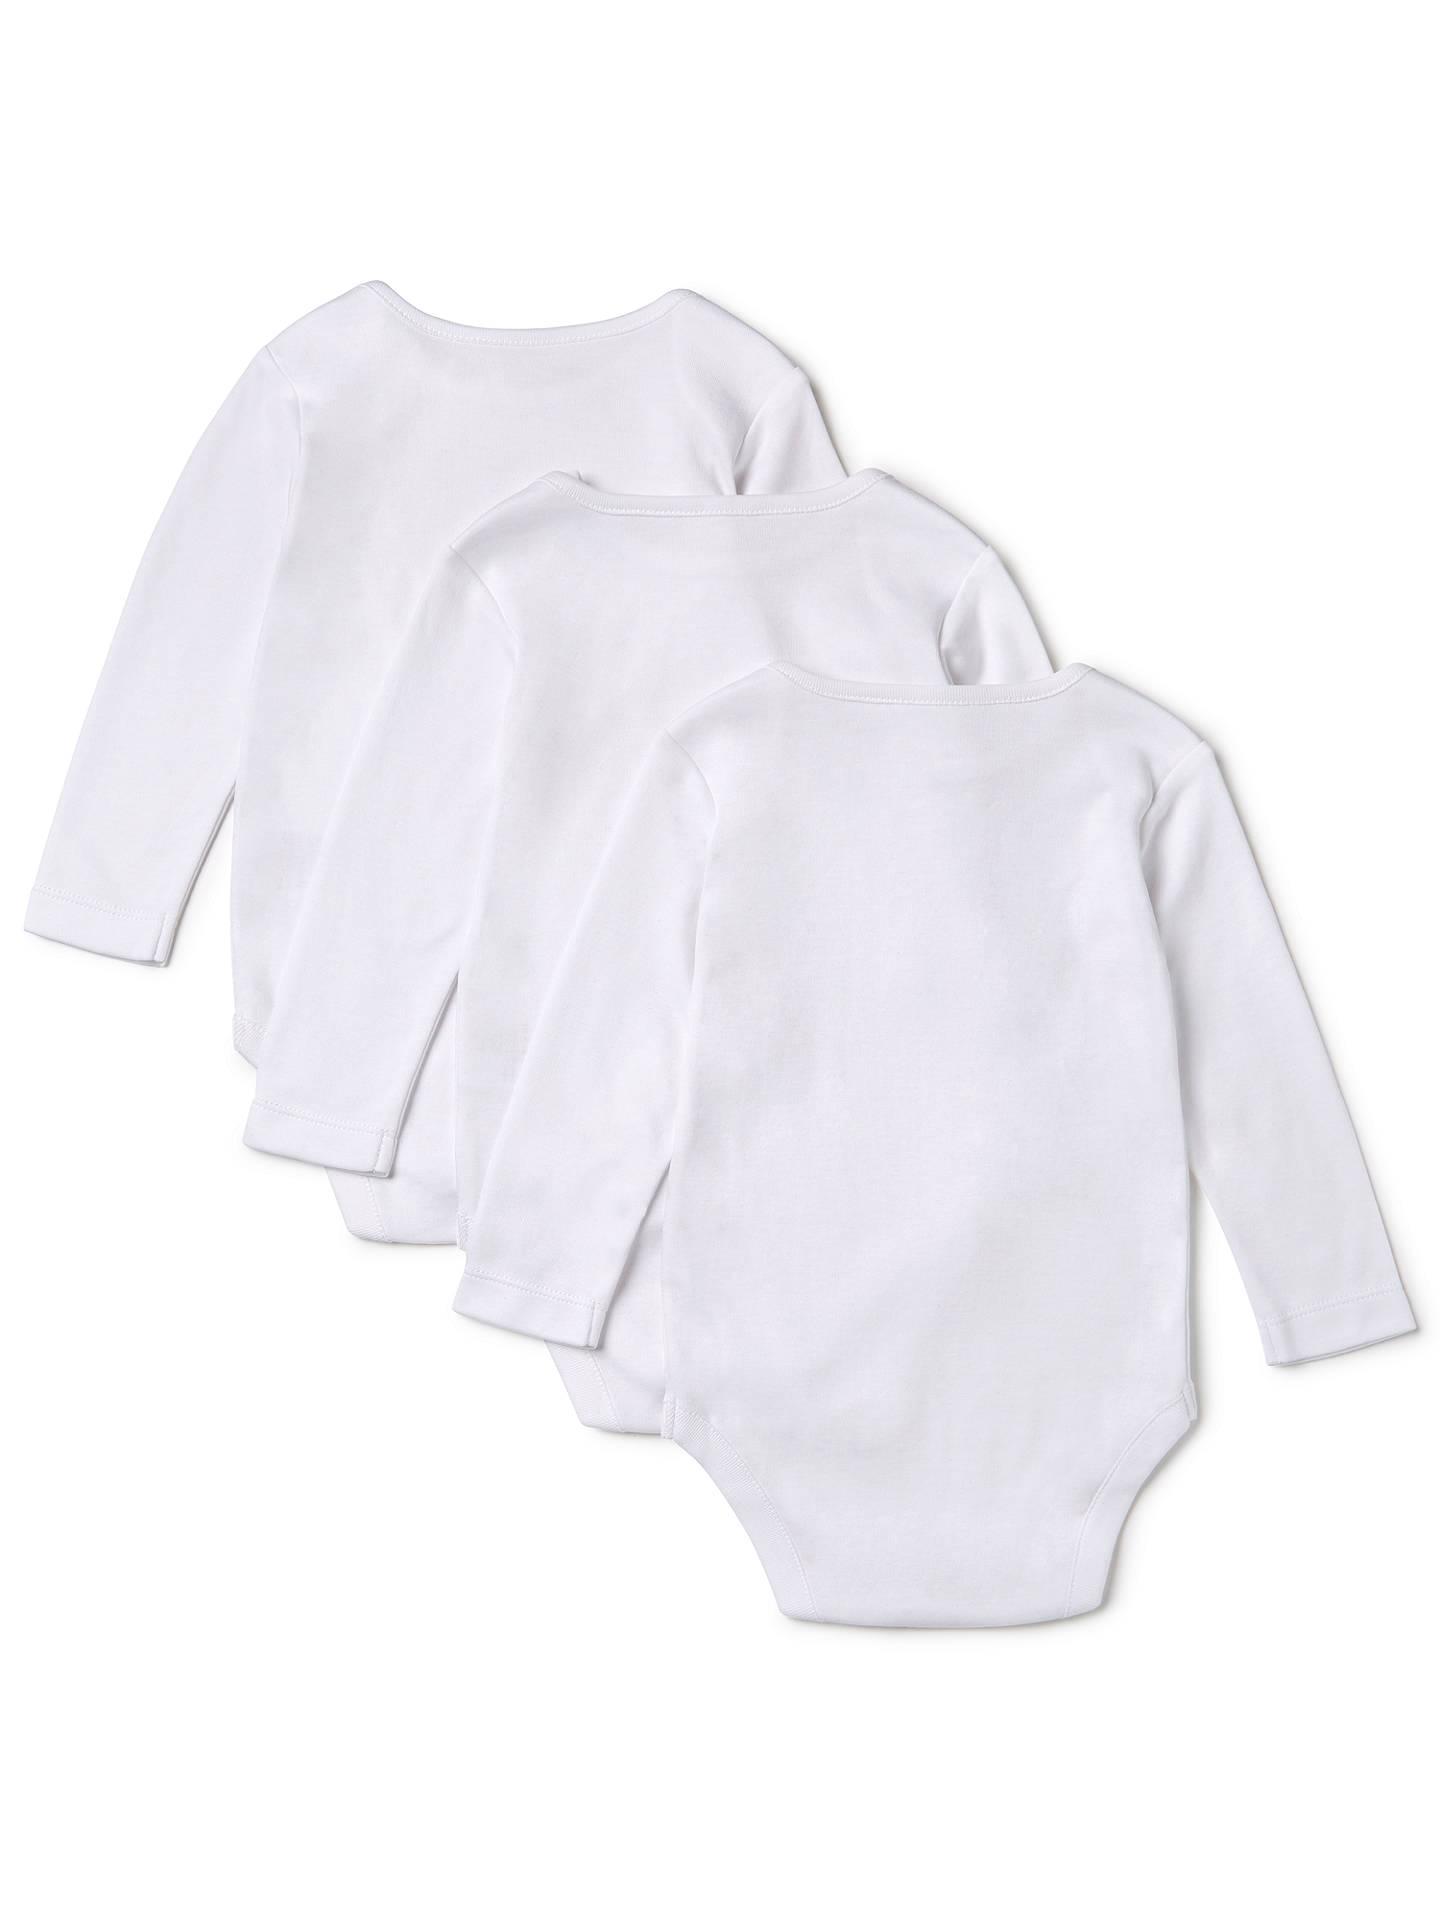 a9a6e9c1 ... Buy John Lewis & Partners Baby Pima Cotton Long Sleeve Bodysuit, Pack of  3, ...